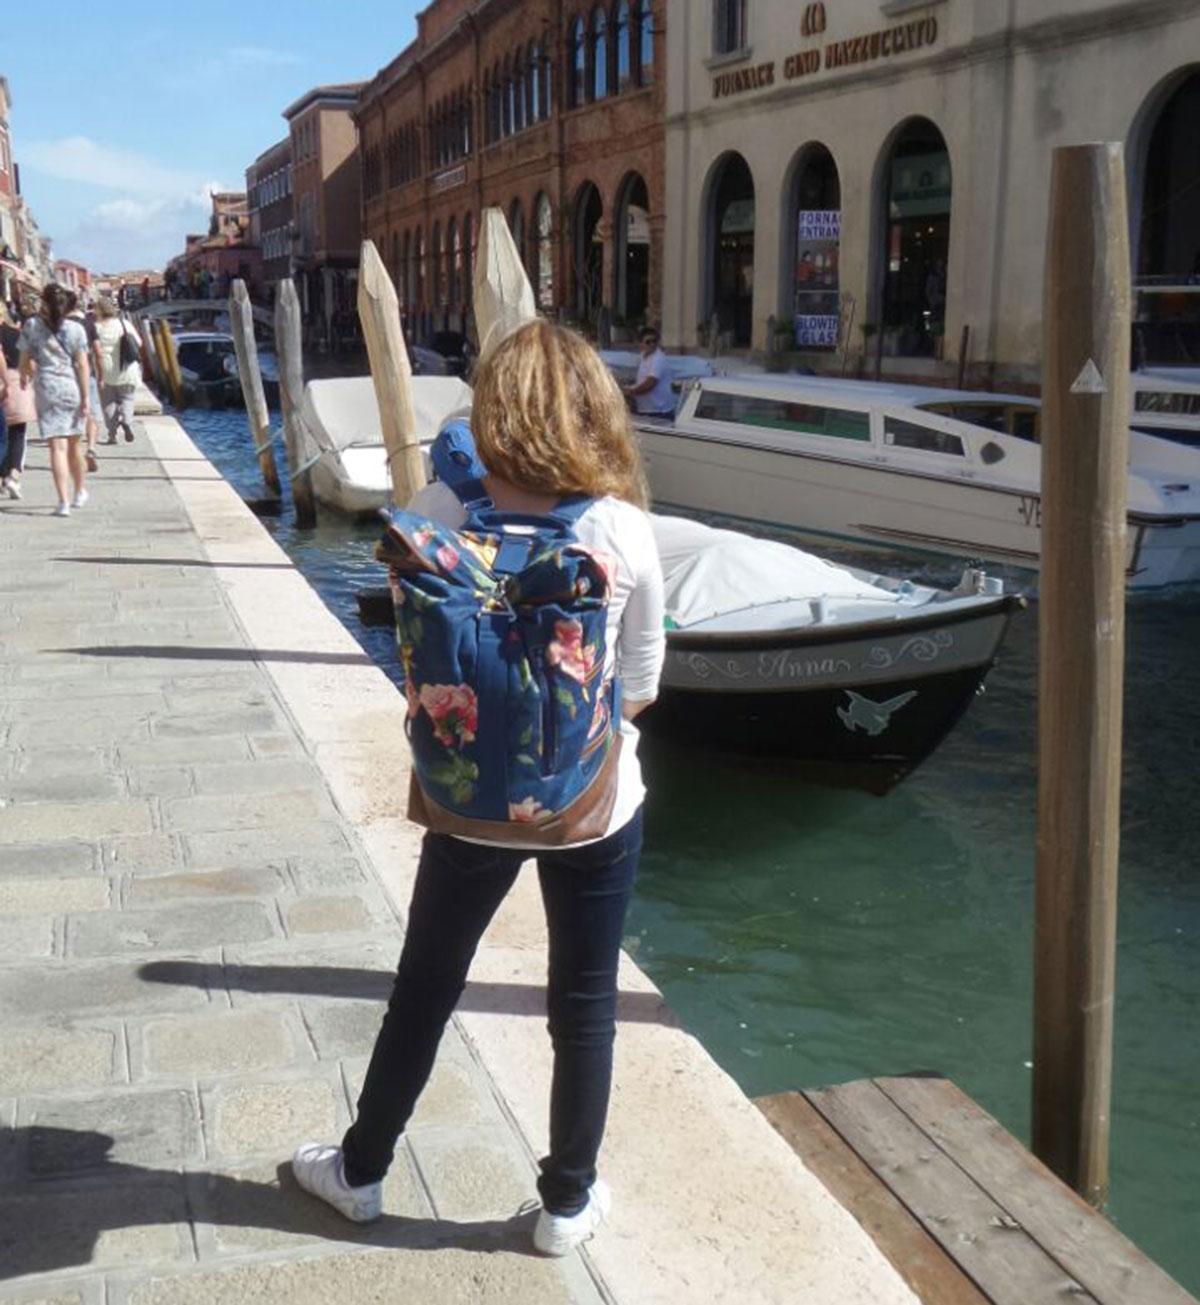 Mamia mit Rucksack No. 1 in Venedig